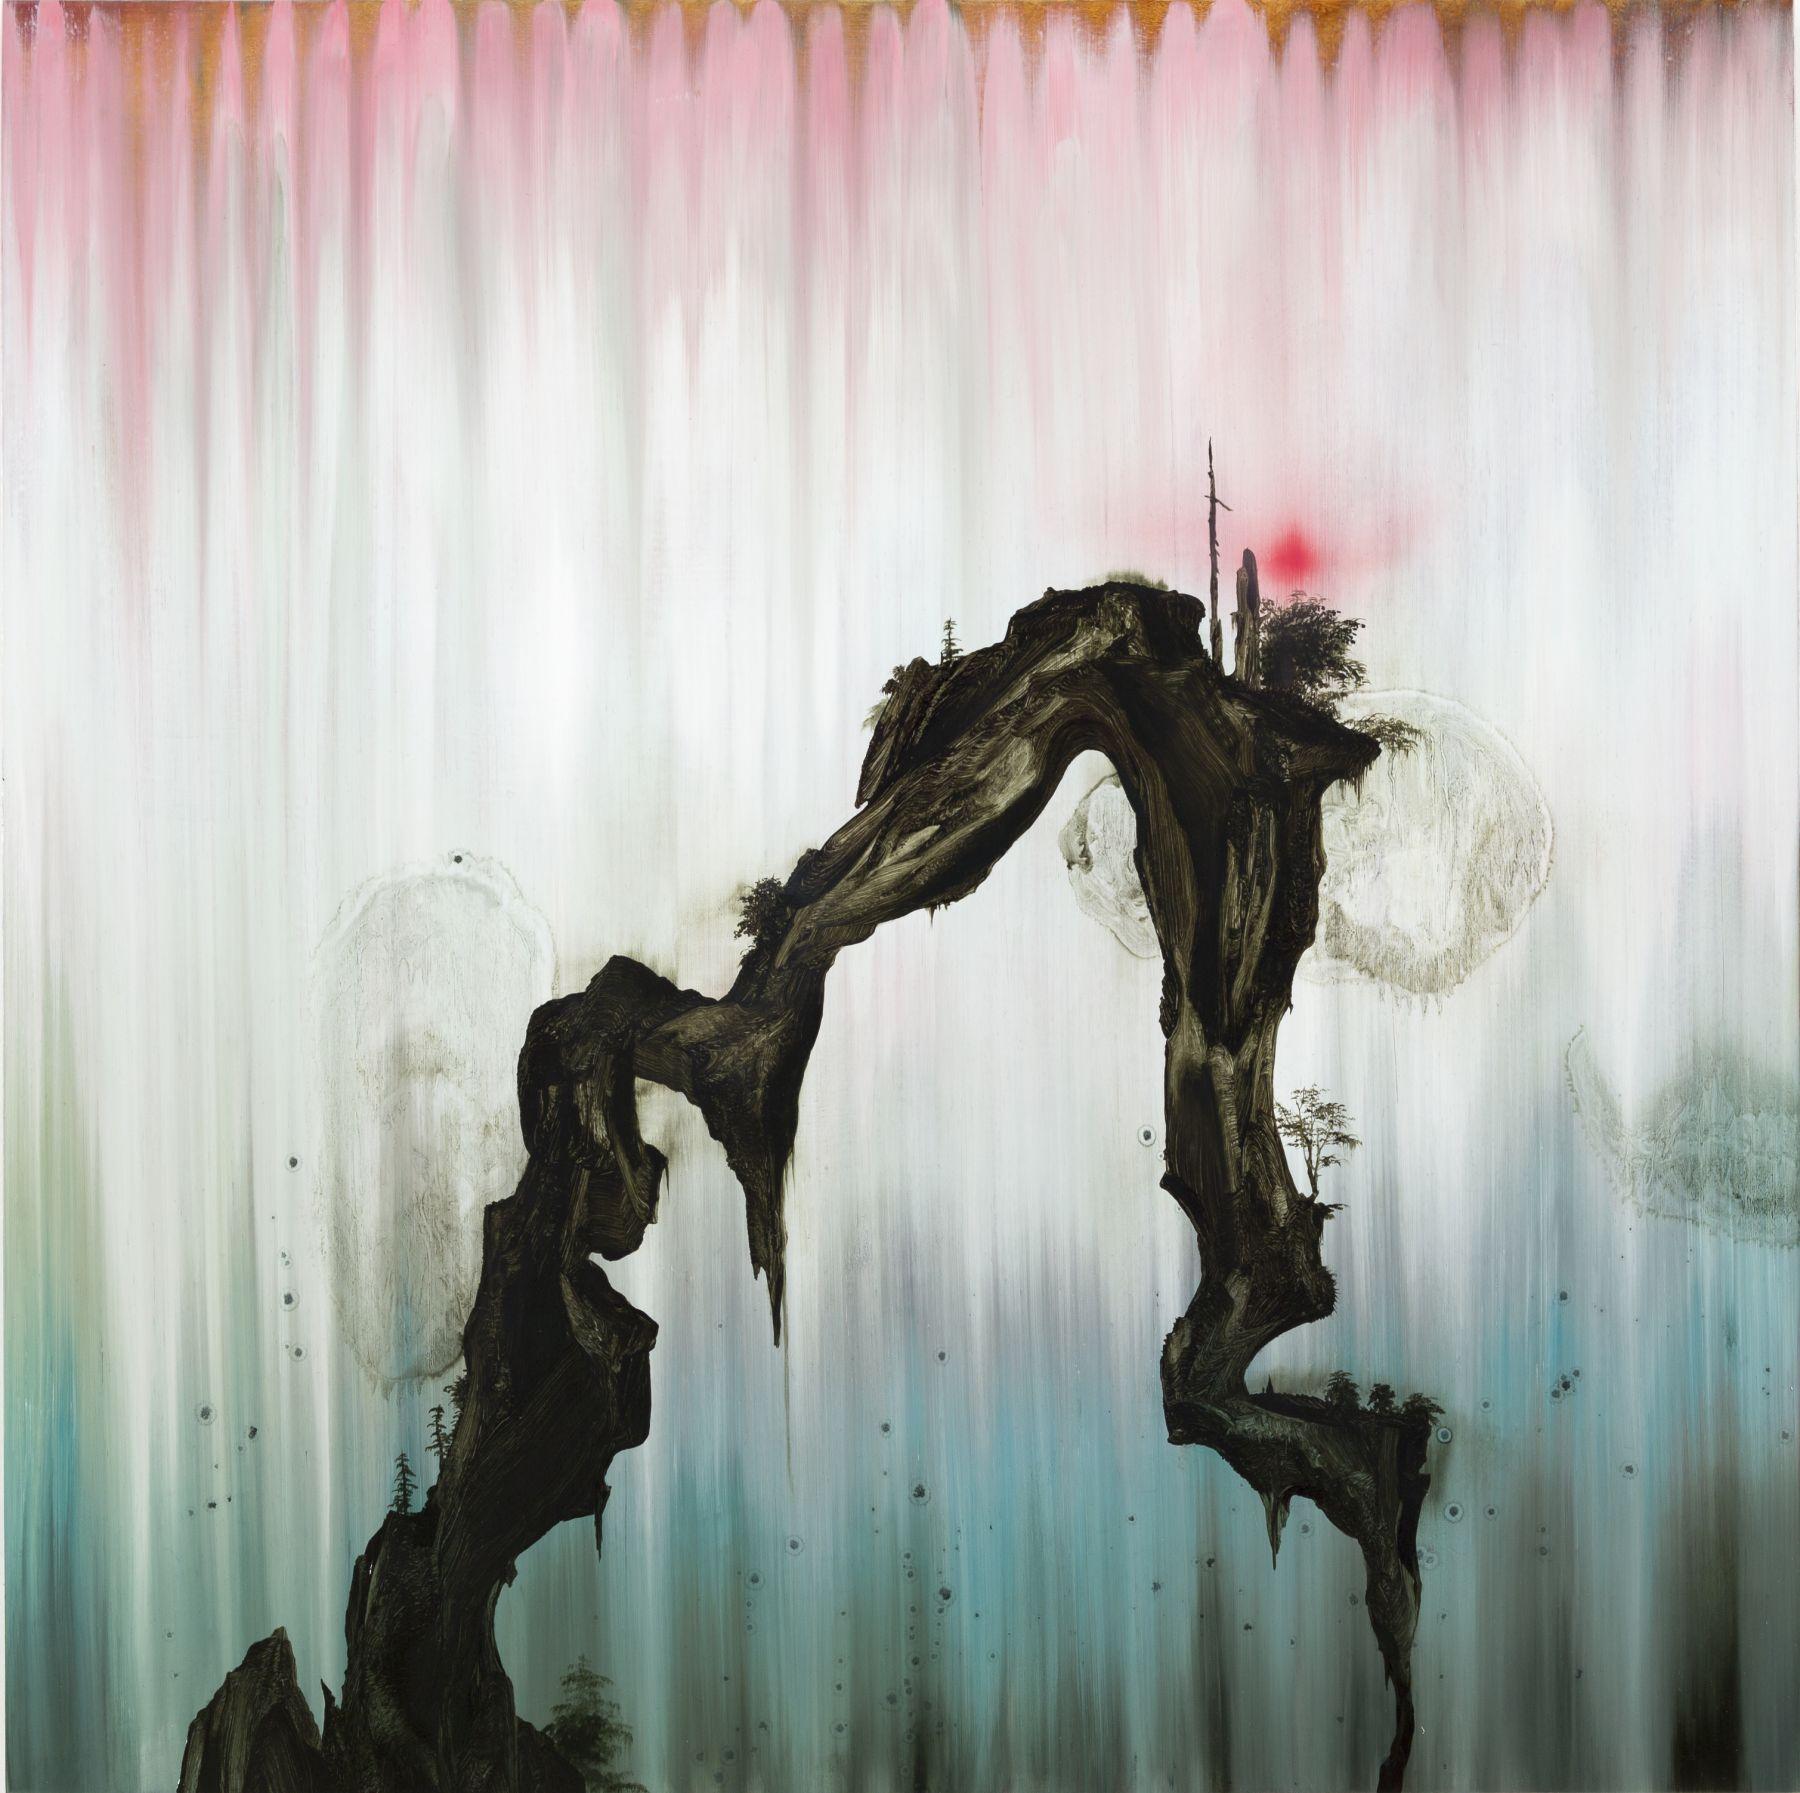 Crossing, 2017 Oil on wood panel